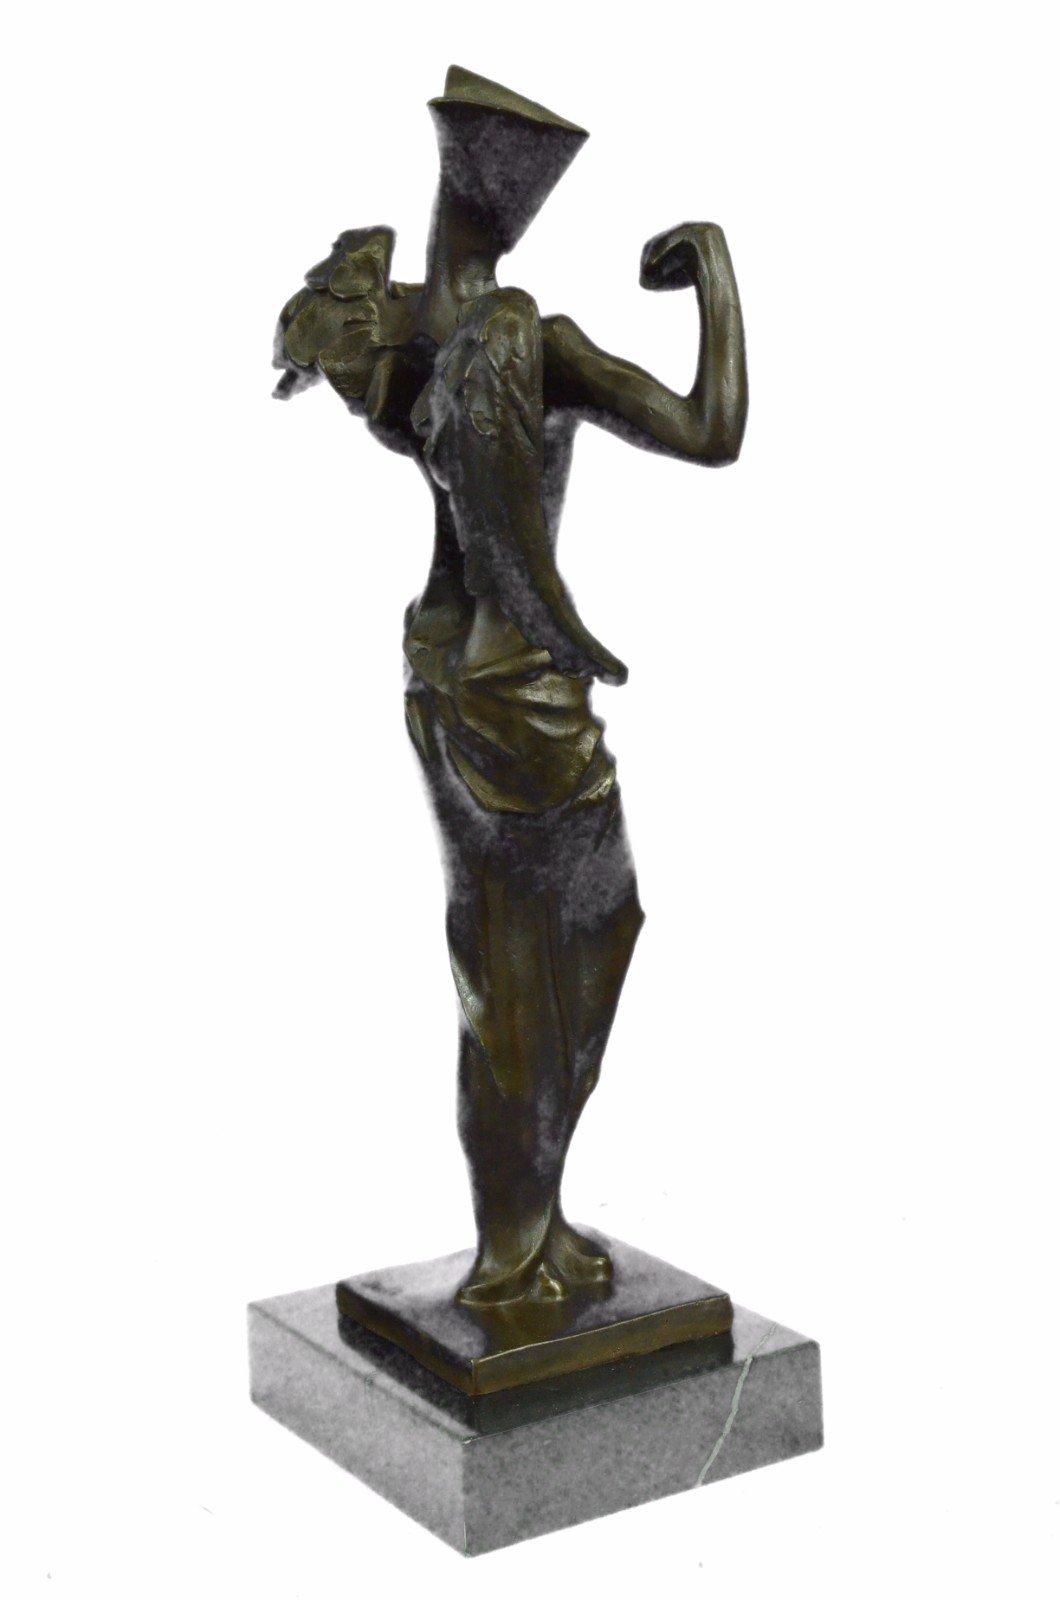 Handmade European Bronze Sculpture Salvator Dali Surrealistic Angel Abstract Modern Art Art Bronze Statue -UKXN-2546-Decor Collectible Gift by Bronzioni (Image #5)